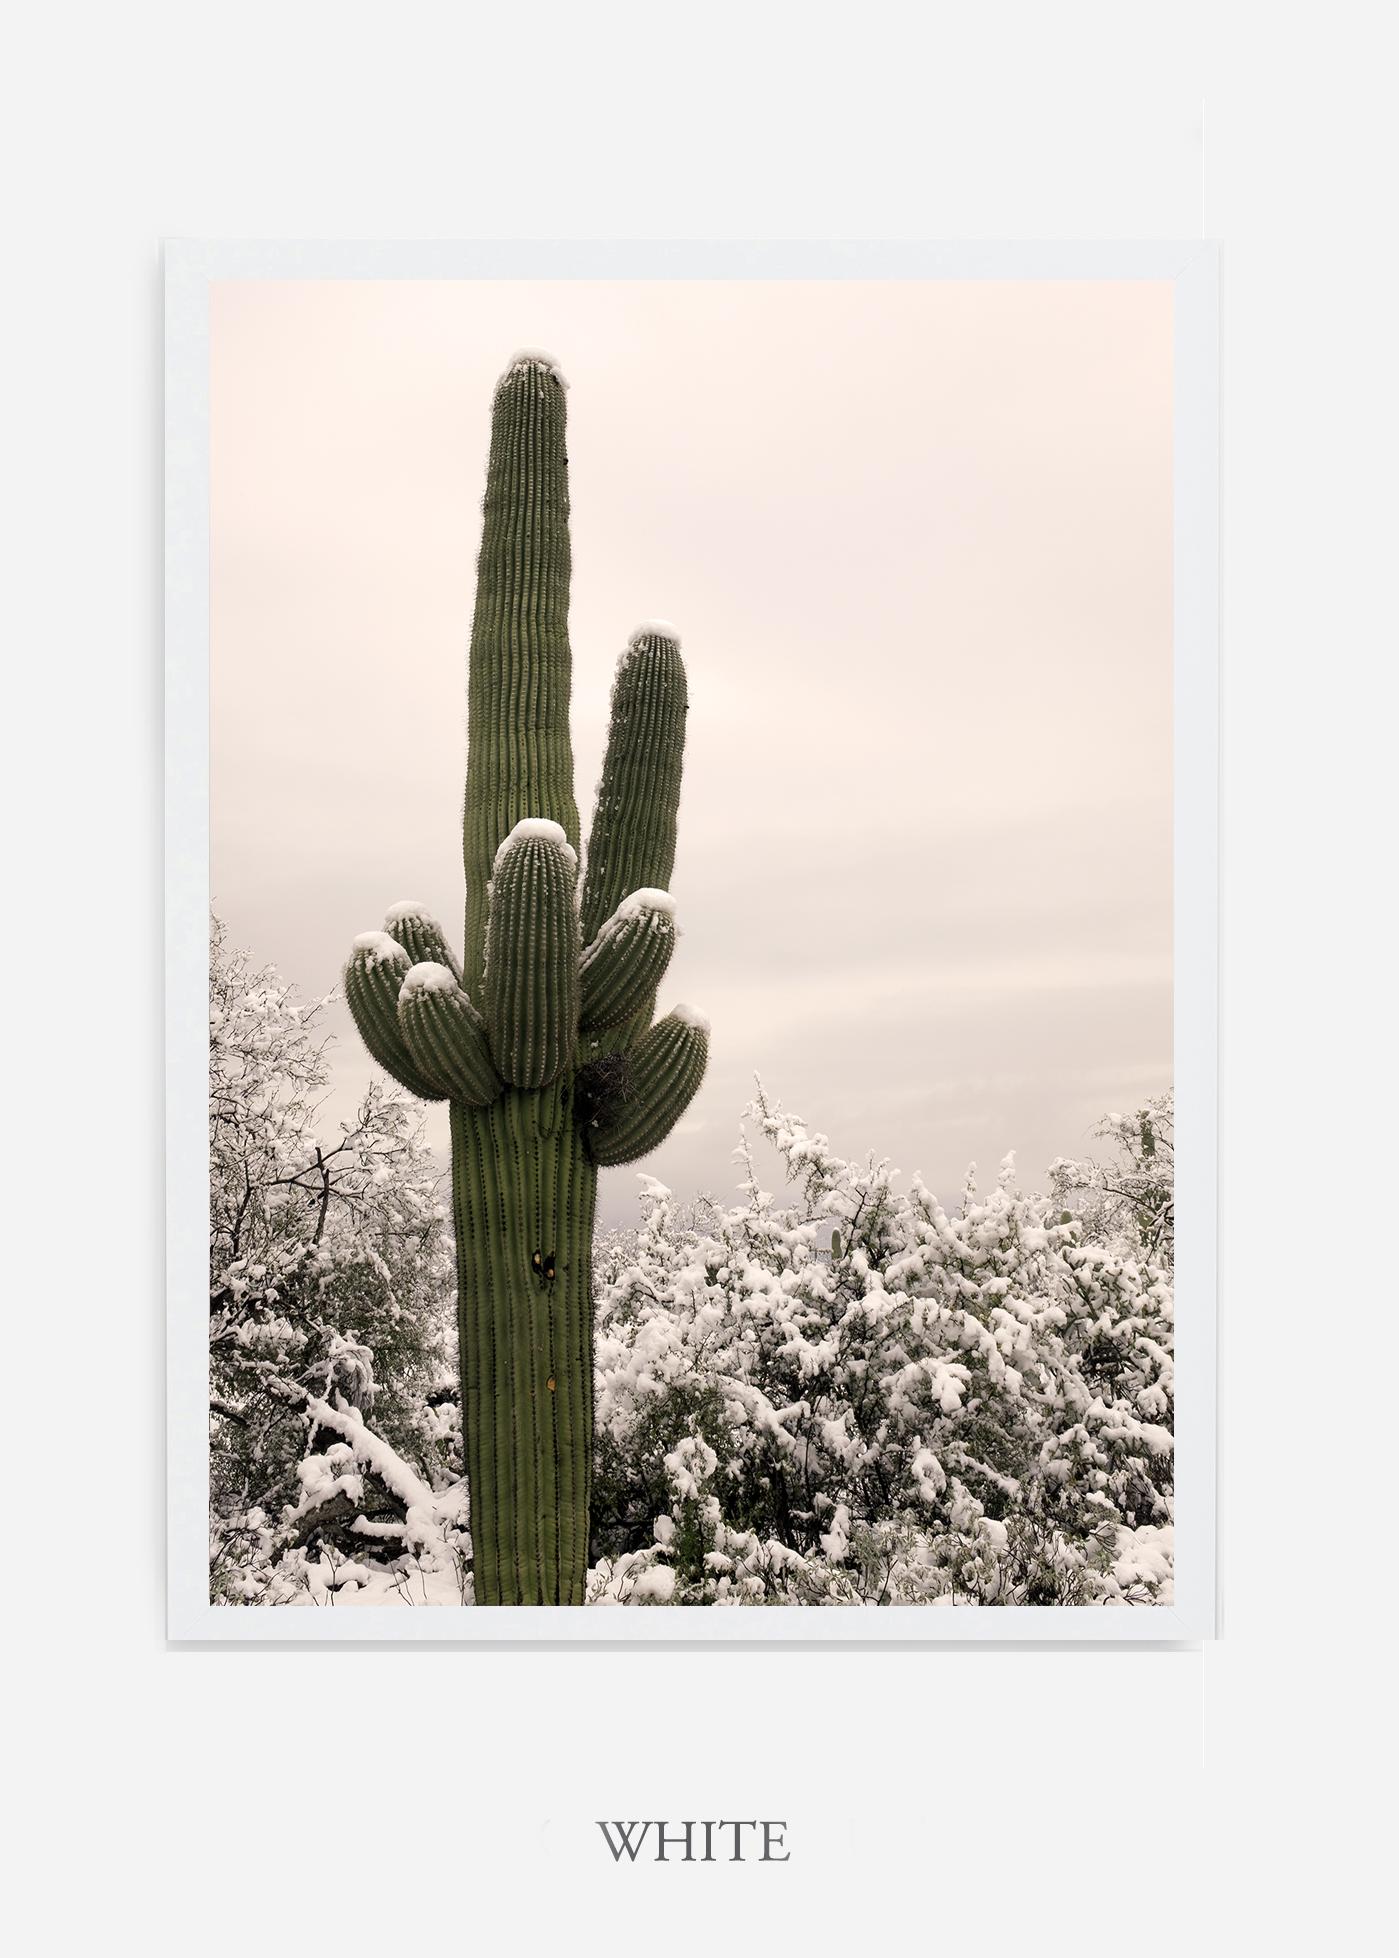 nomat-whiteframe-saguaroNo.6-wildercalifornia-art-wallart-cactusprint-homedecor-prints-arizona-botanical-artwork-interiordesign.jpg